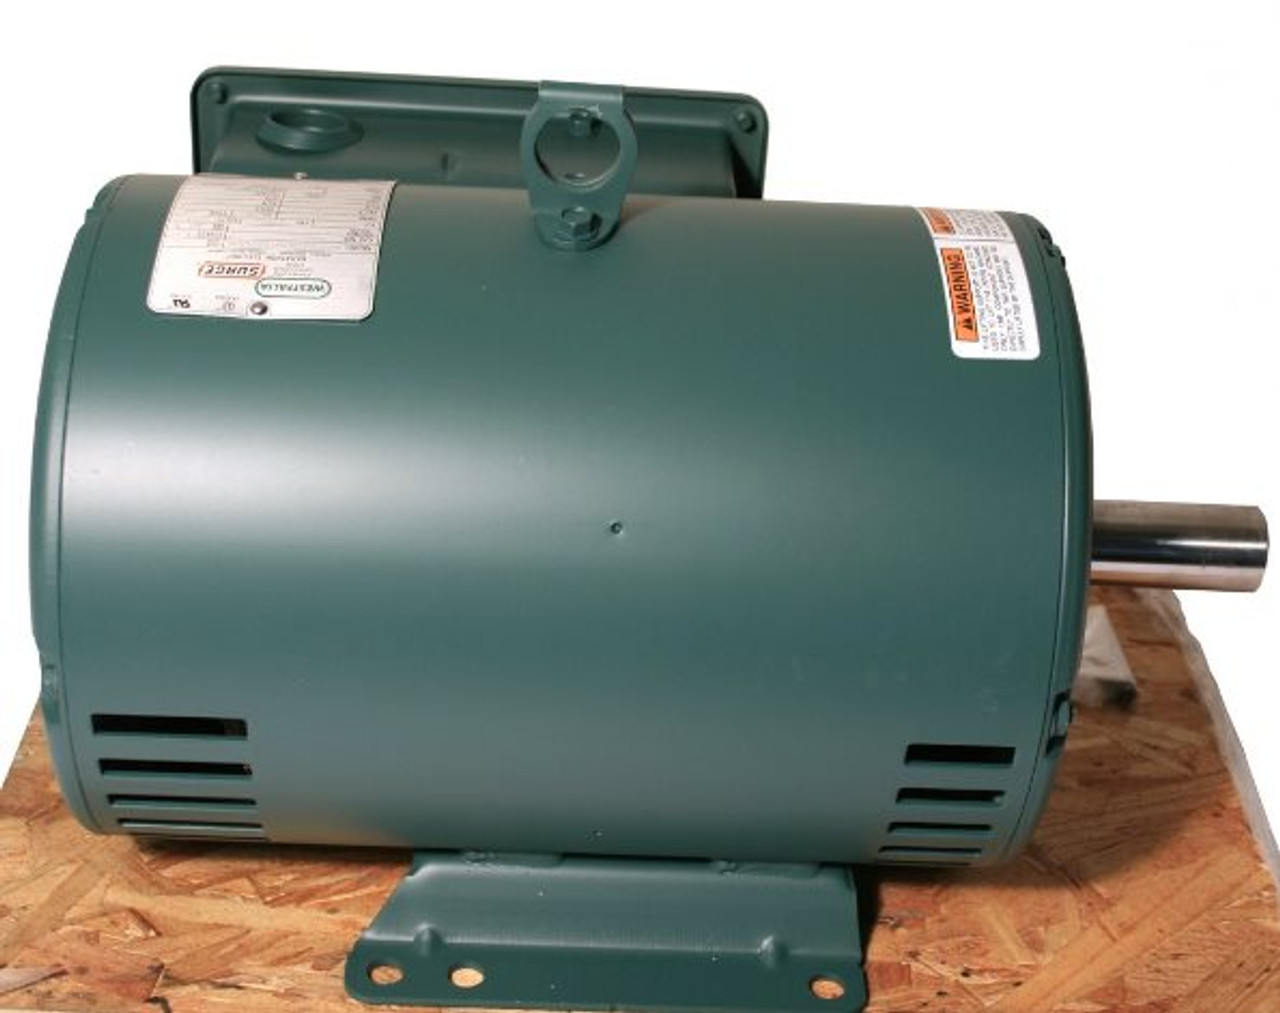 5 Hp Electric Motor >> 5 Hp Surge Alamo Electric Motor